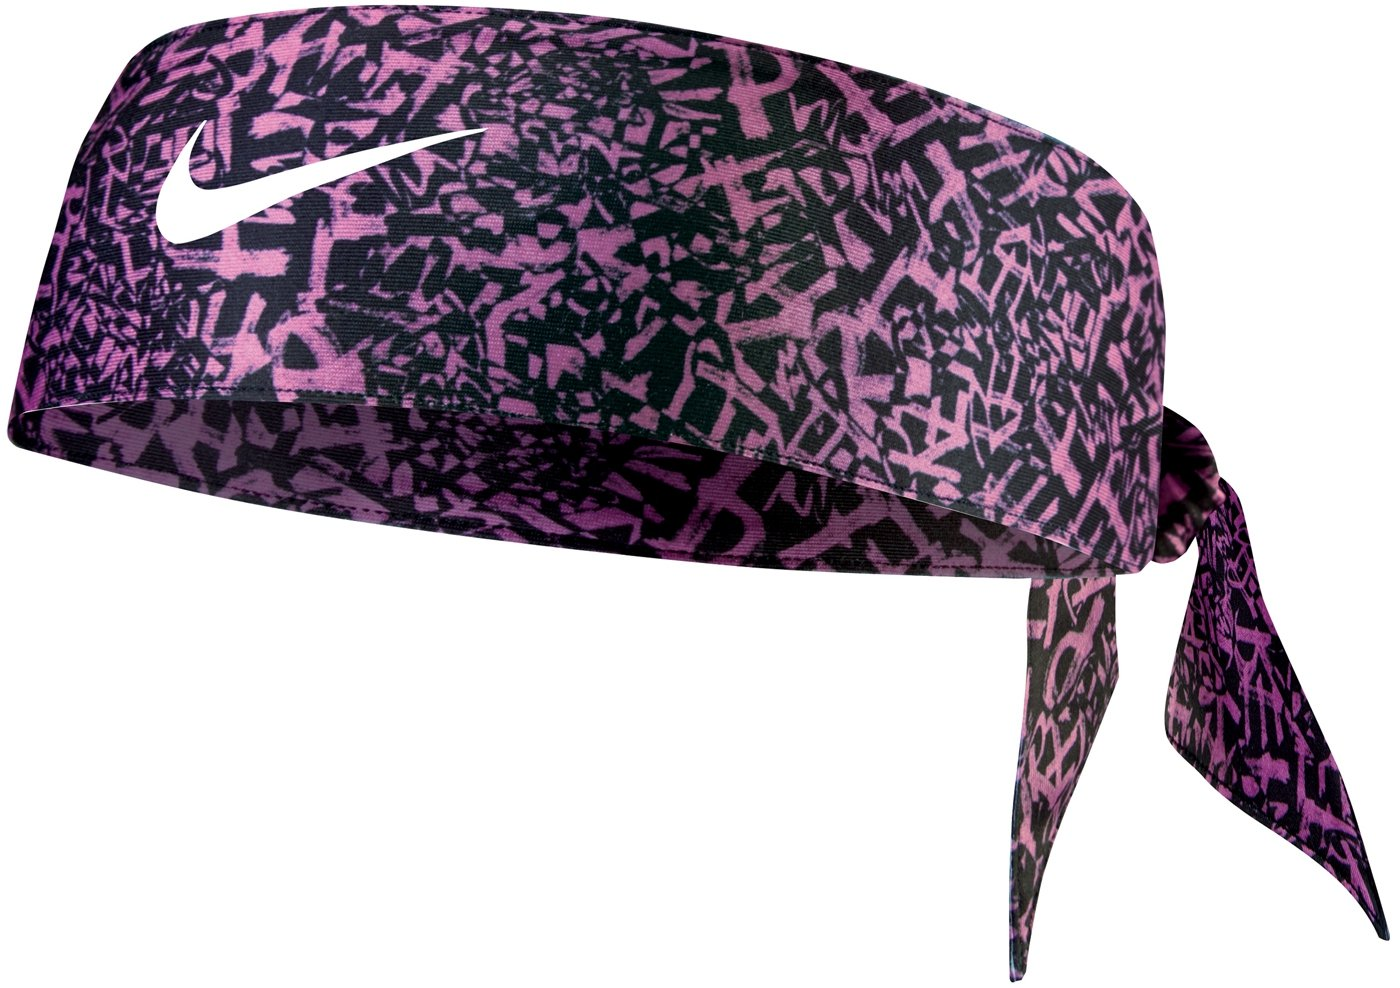 Galleon - Nike Printed Dri-Fit Head Tie 2.0 8b5ba1c4cf6